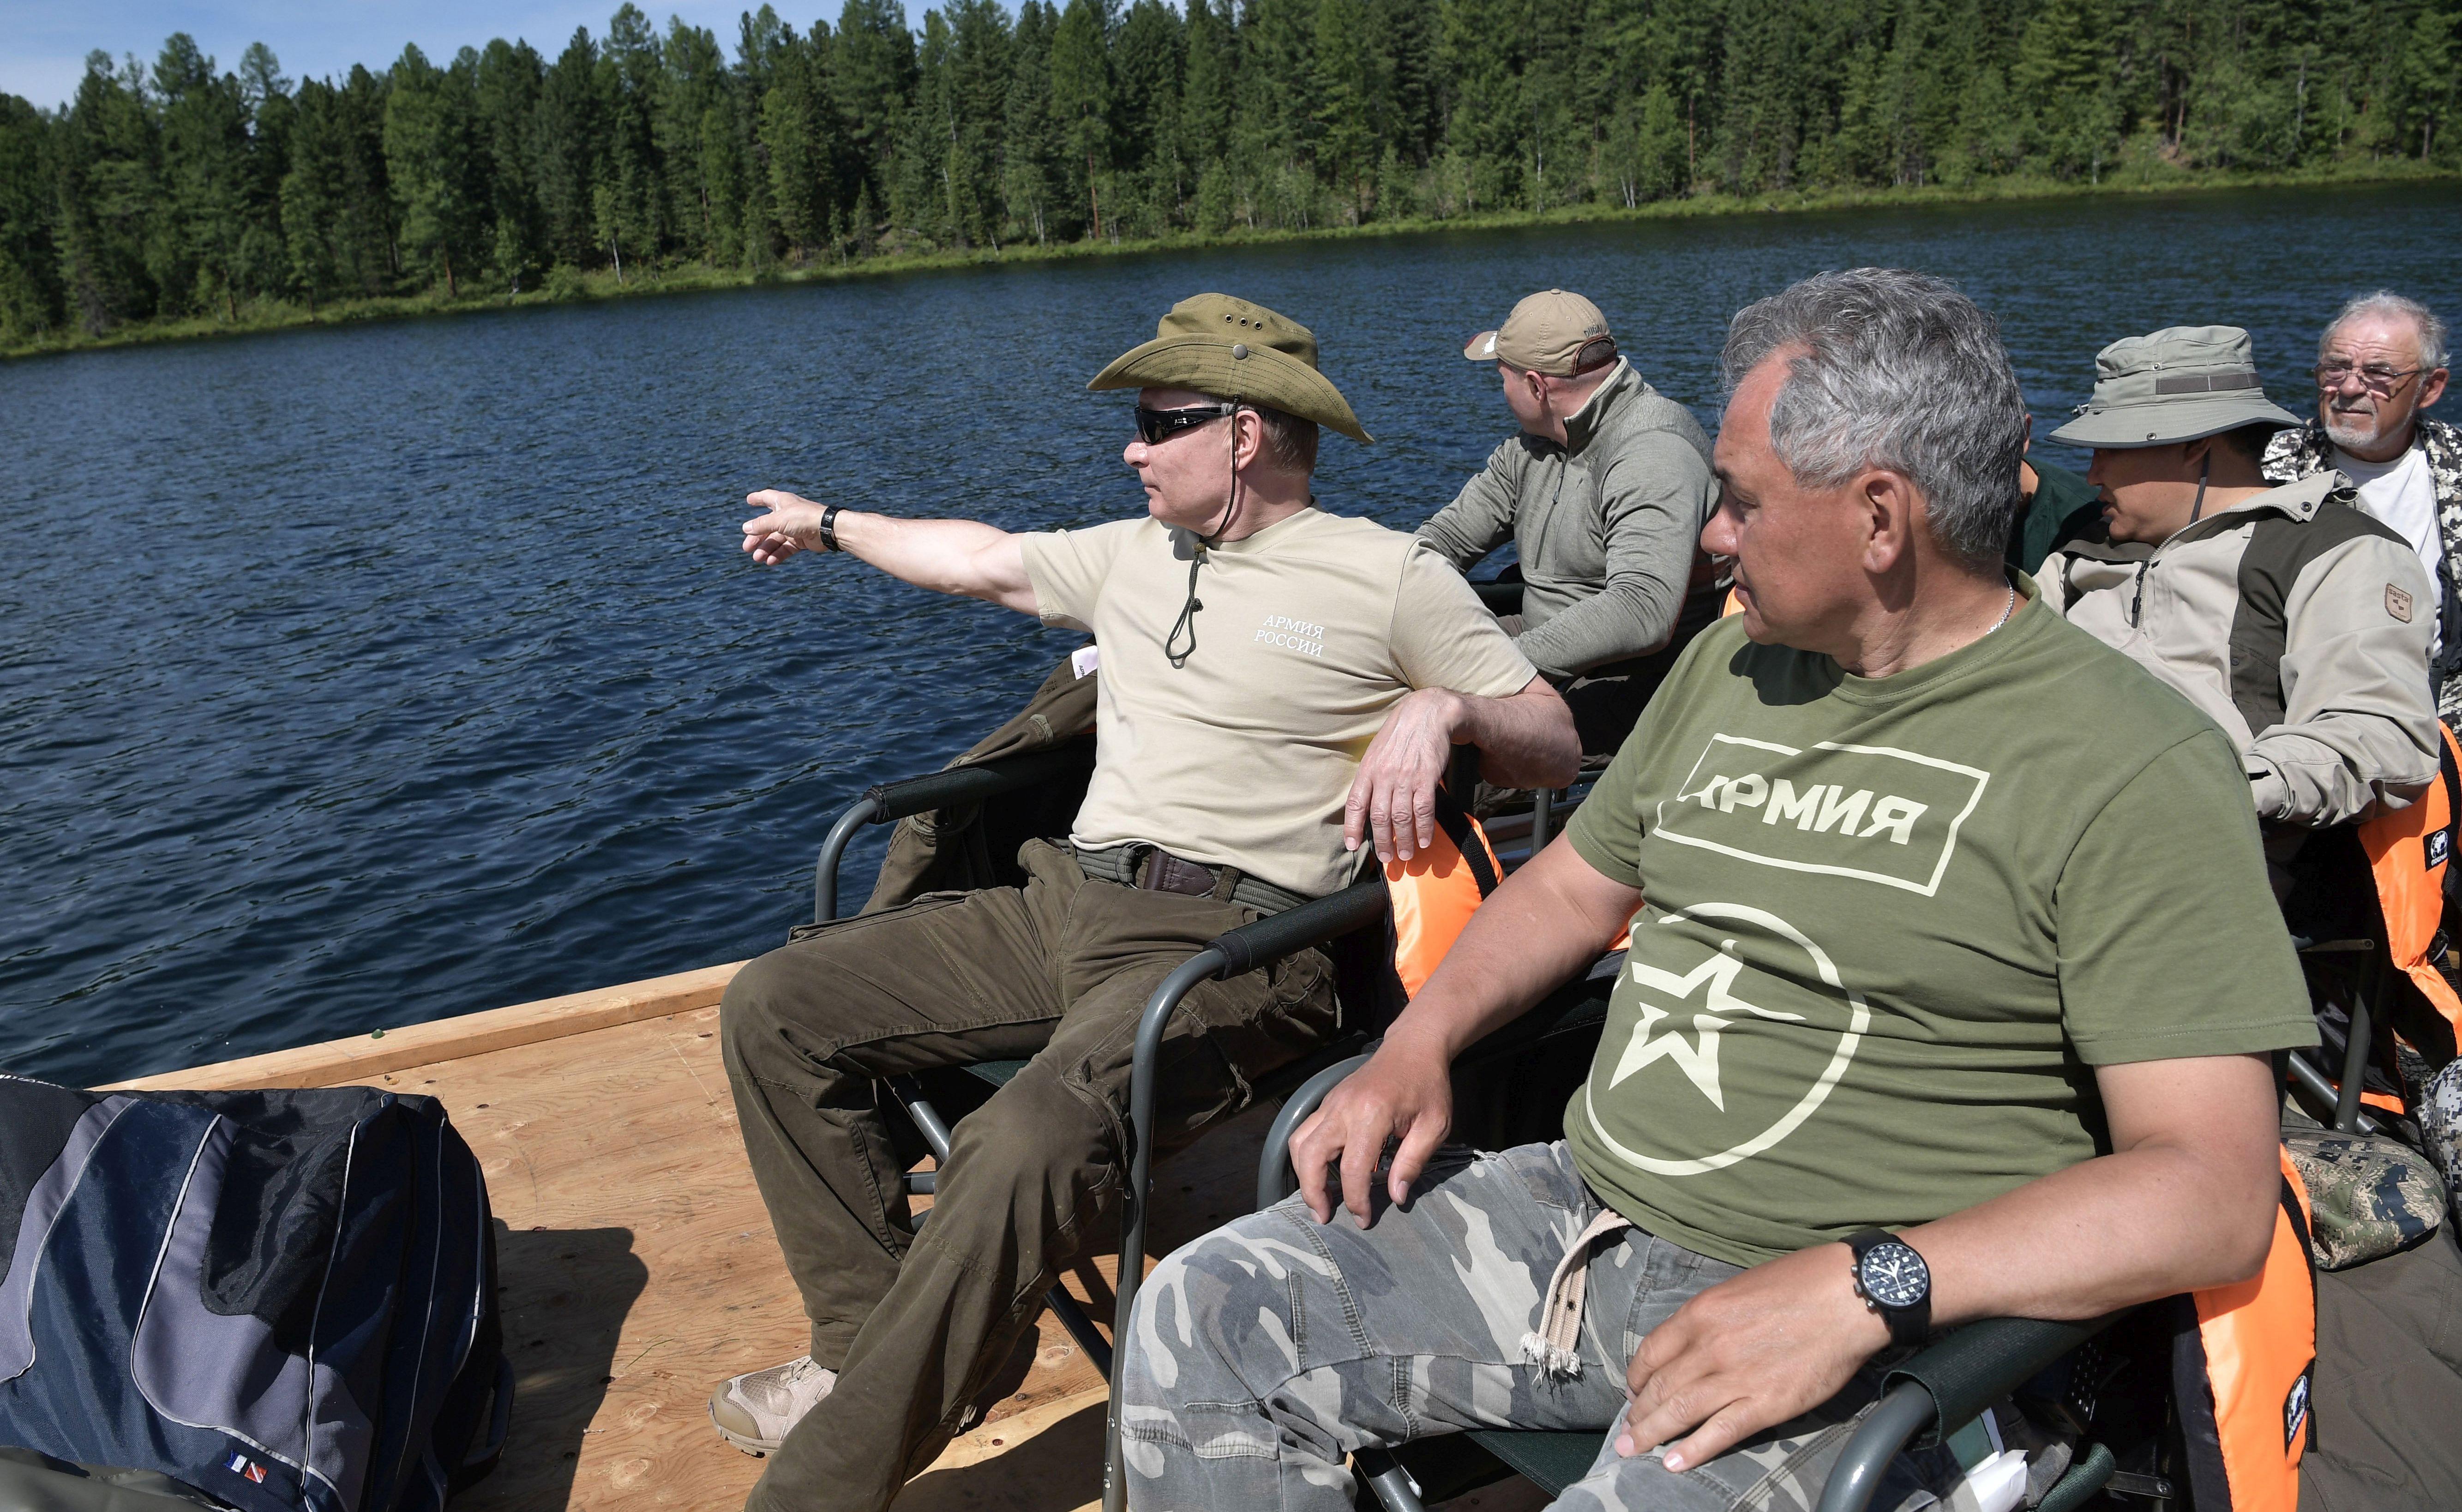 Putin proveo tri dana u lovu i ribolovu u Sibiru